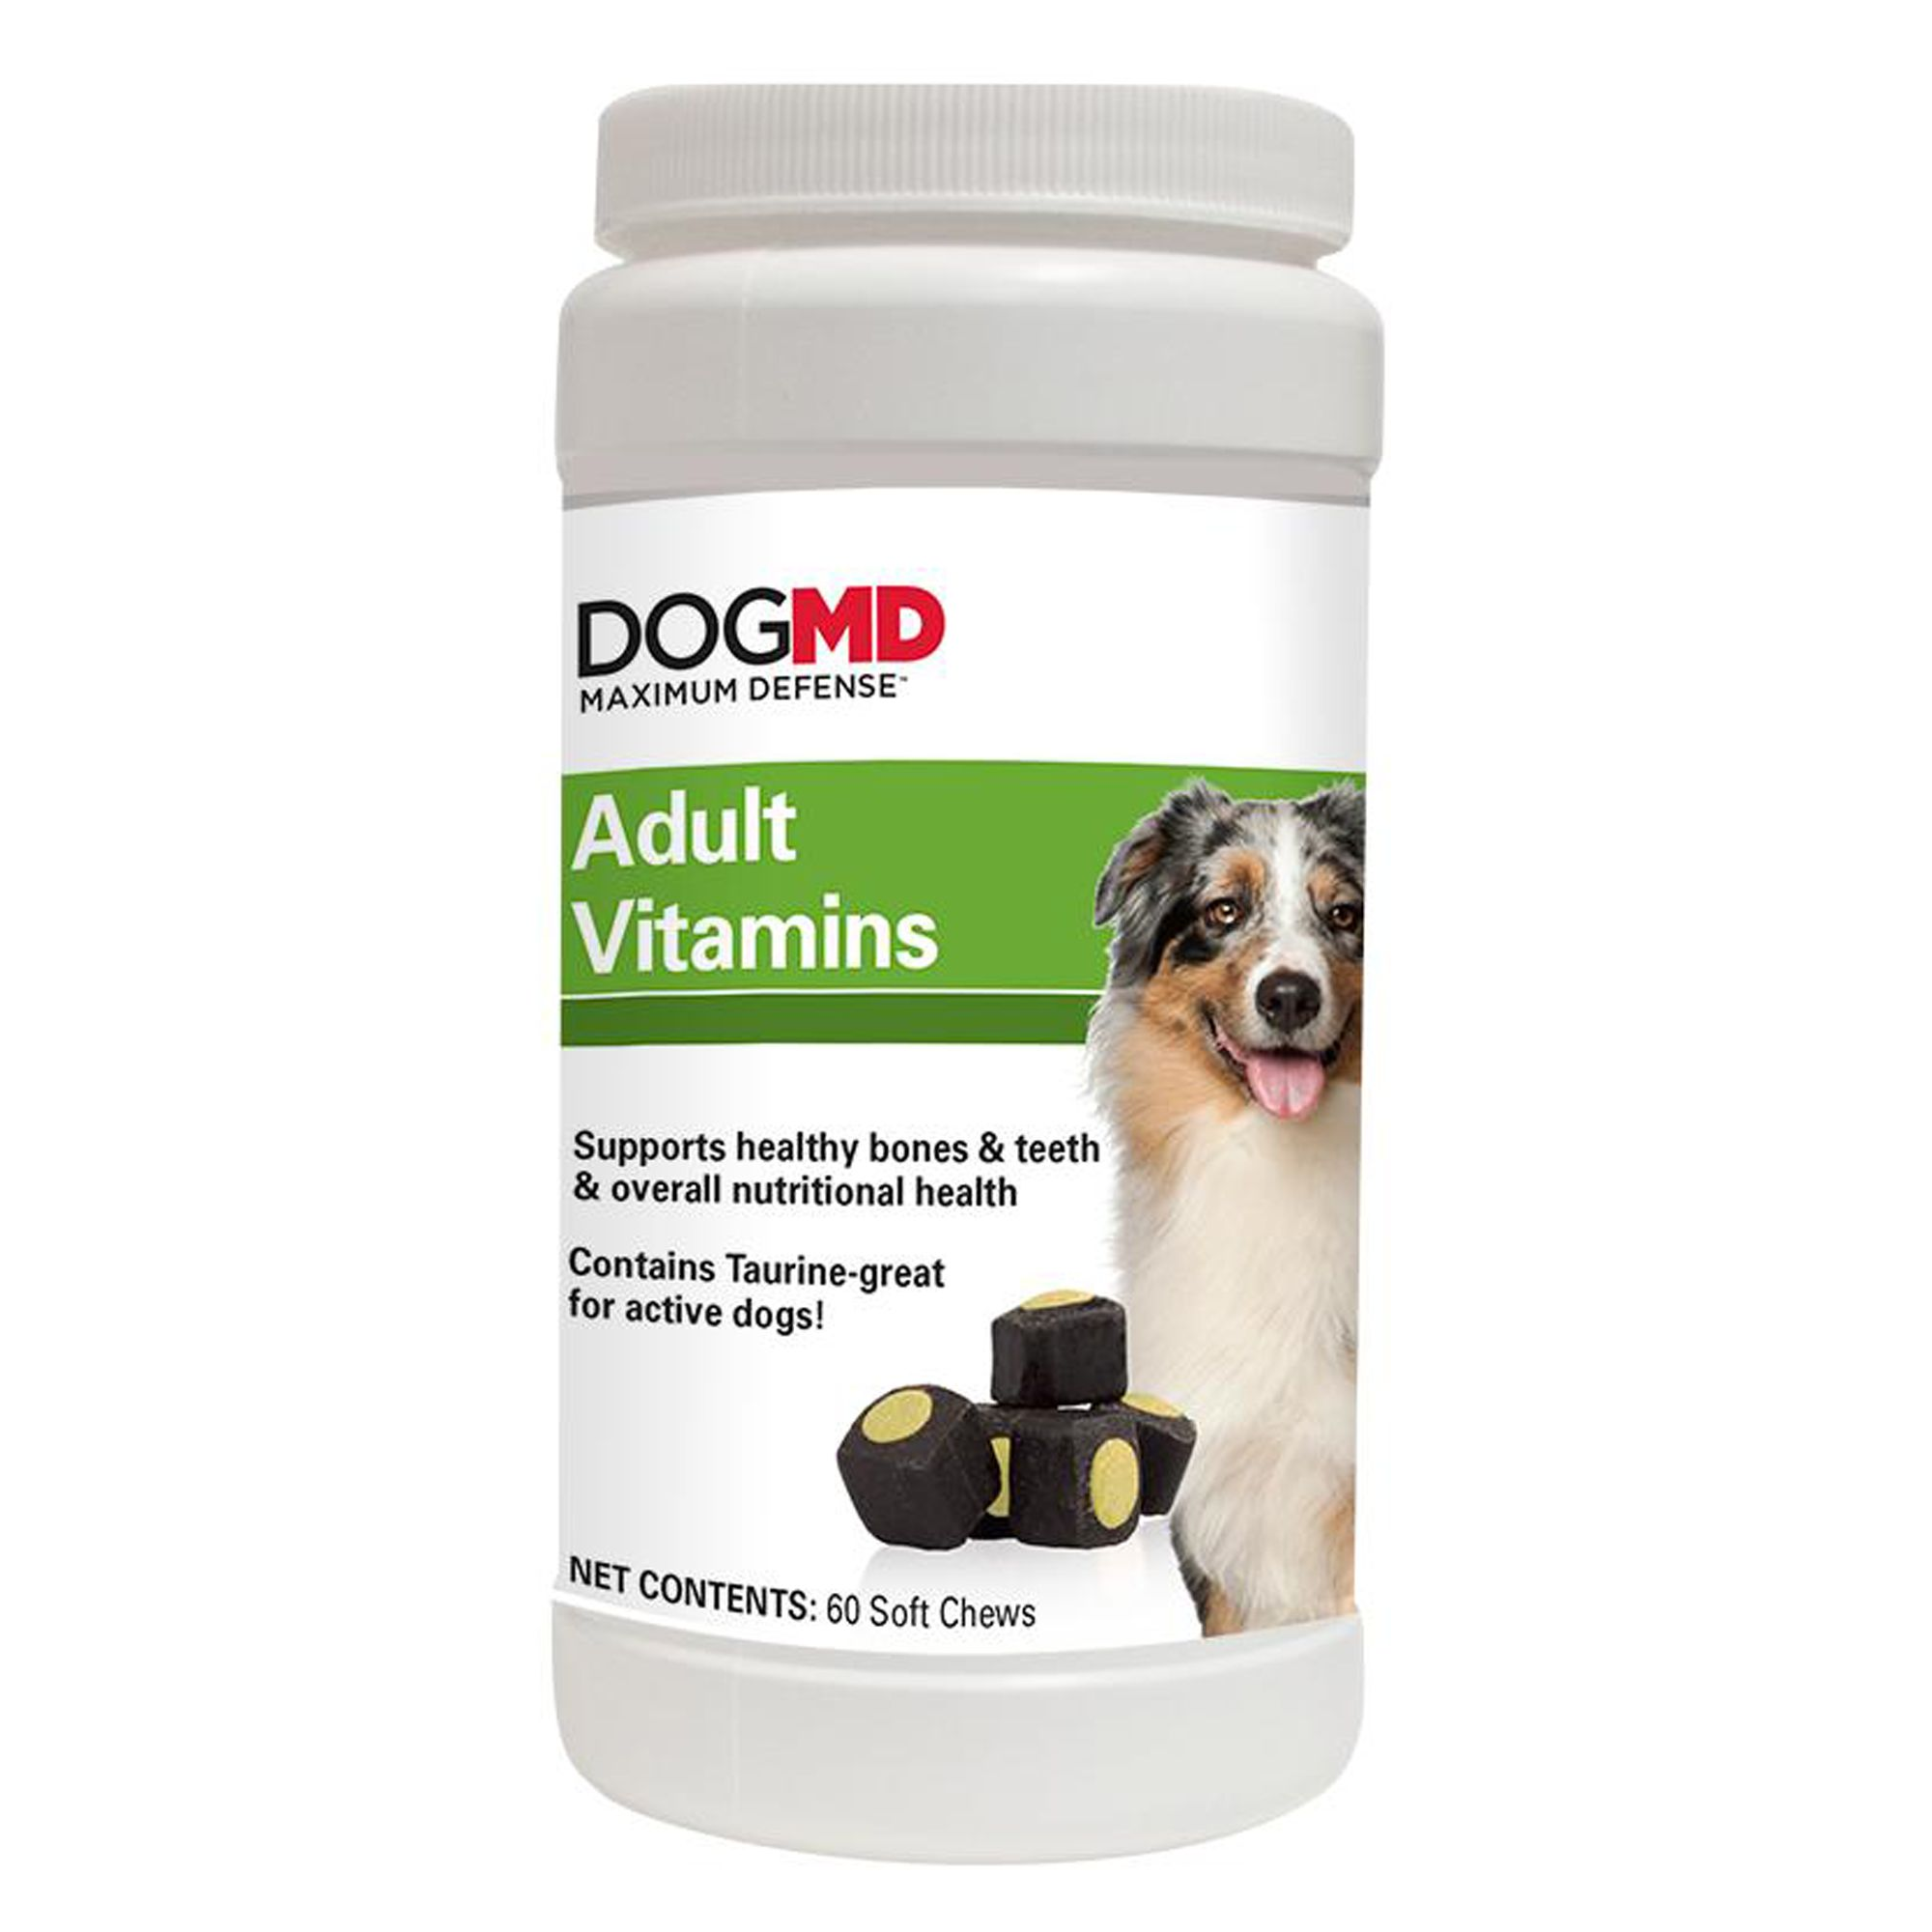 Dog Md Maximum Defense Adult Vitamins Size 60 Count